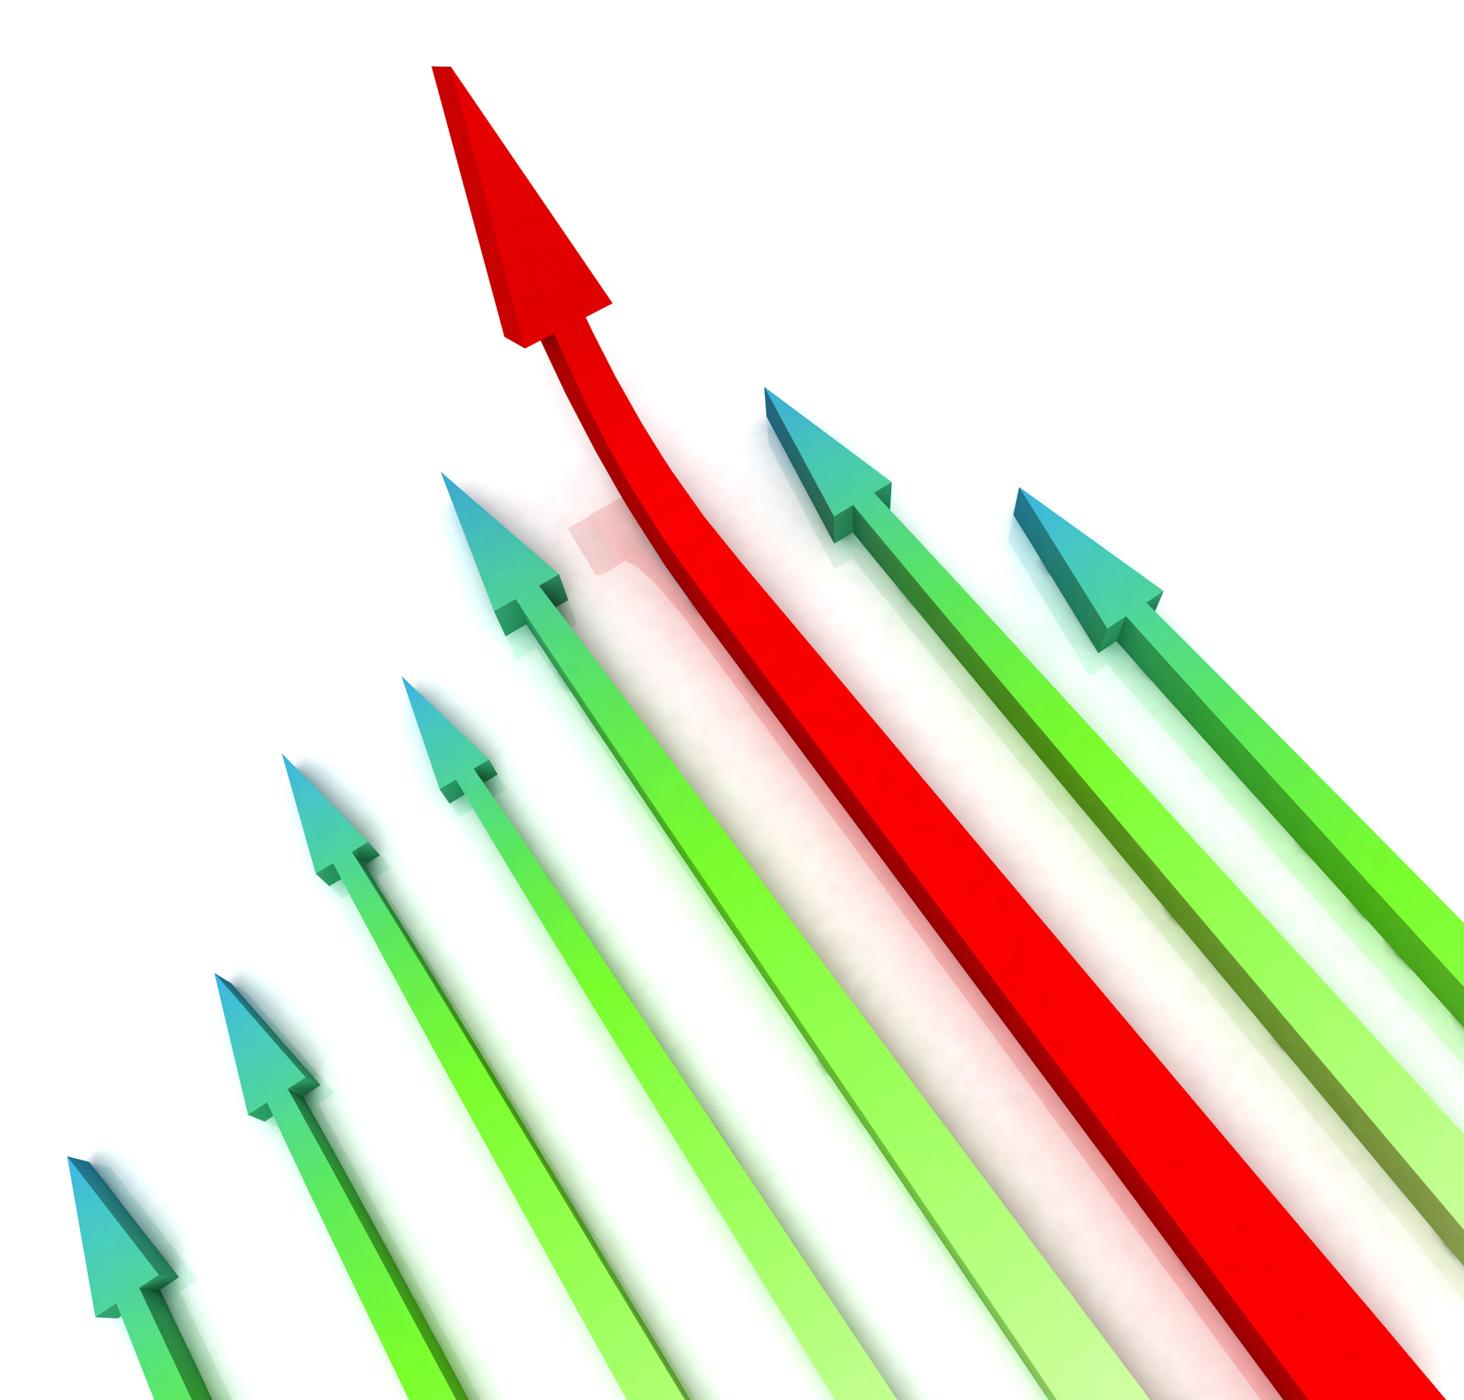 Red left arrow ahead shows growth photo